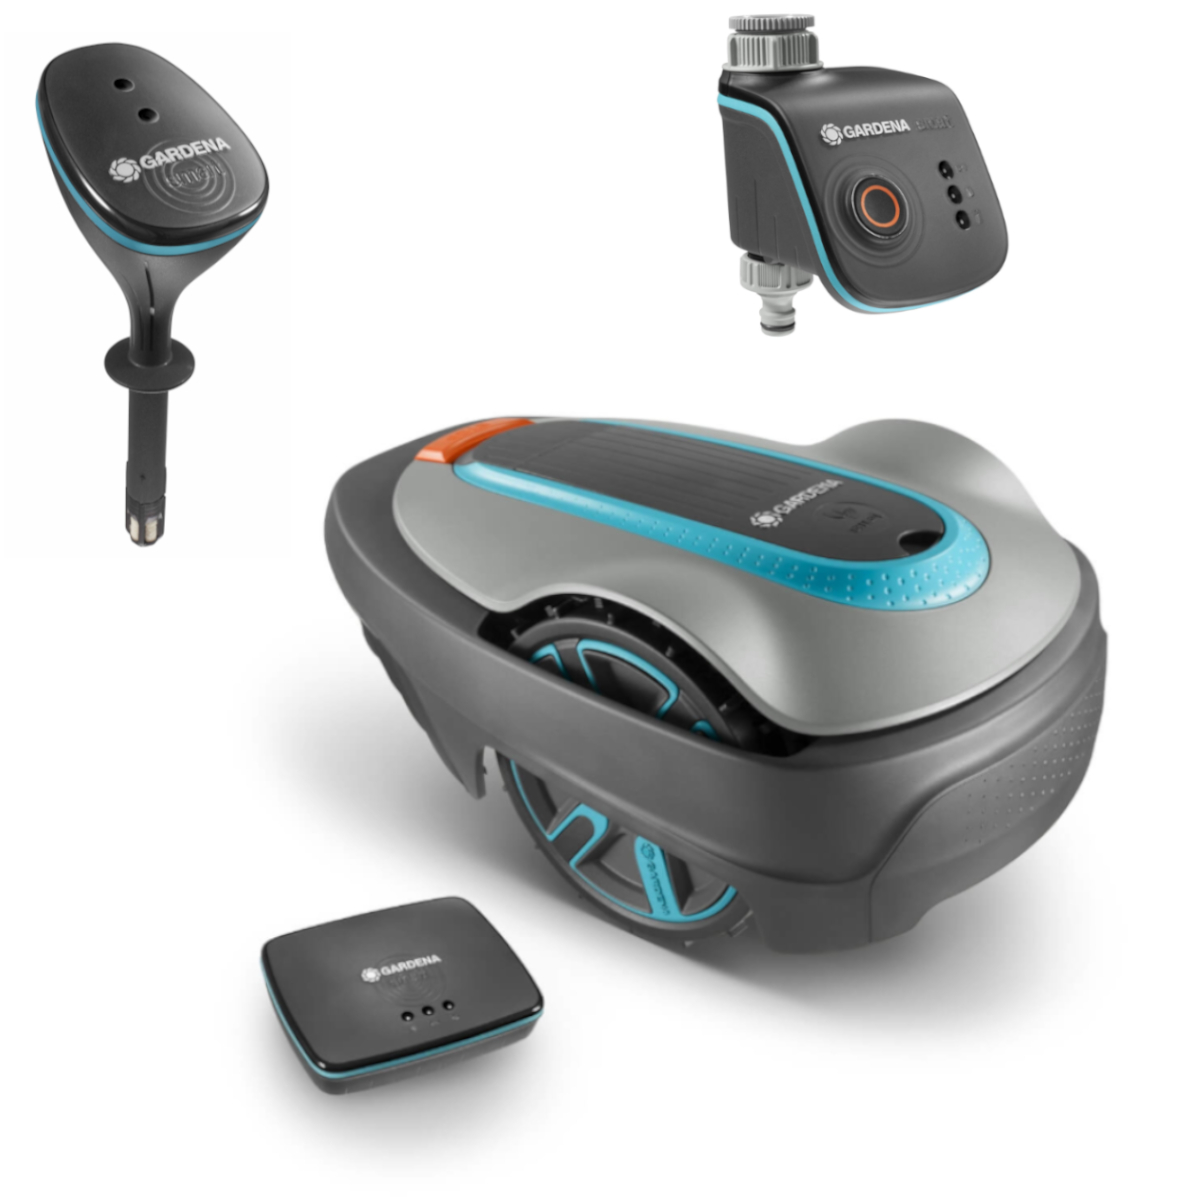 GARDENA Mähroboter Komplettset   Inklusive Mähroboter, Gateway, smart Sensor, smart Water Control